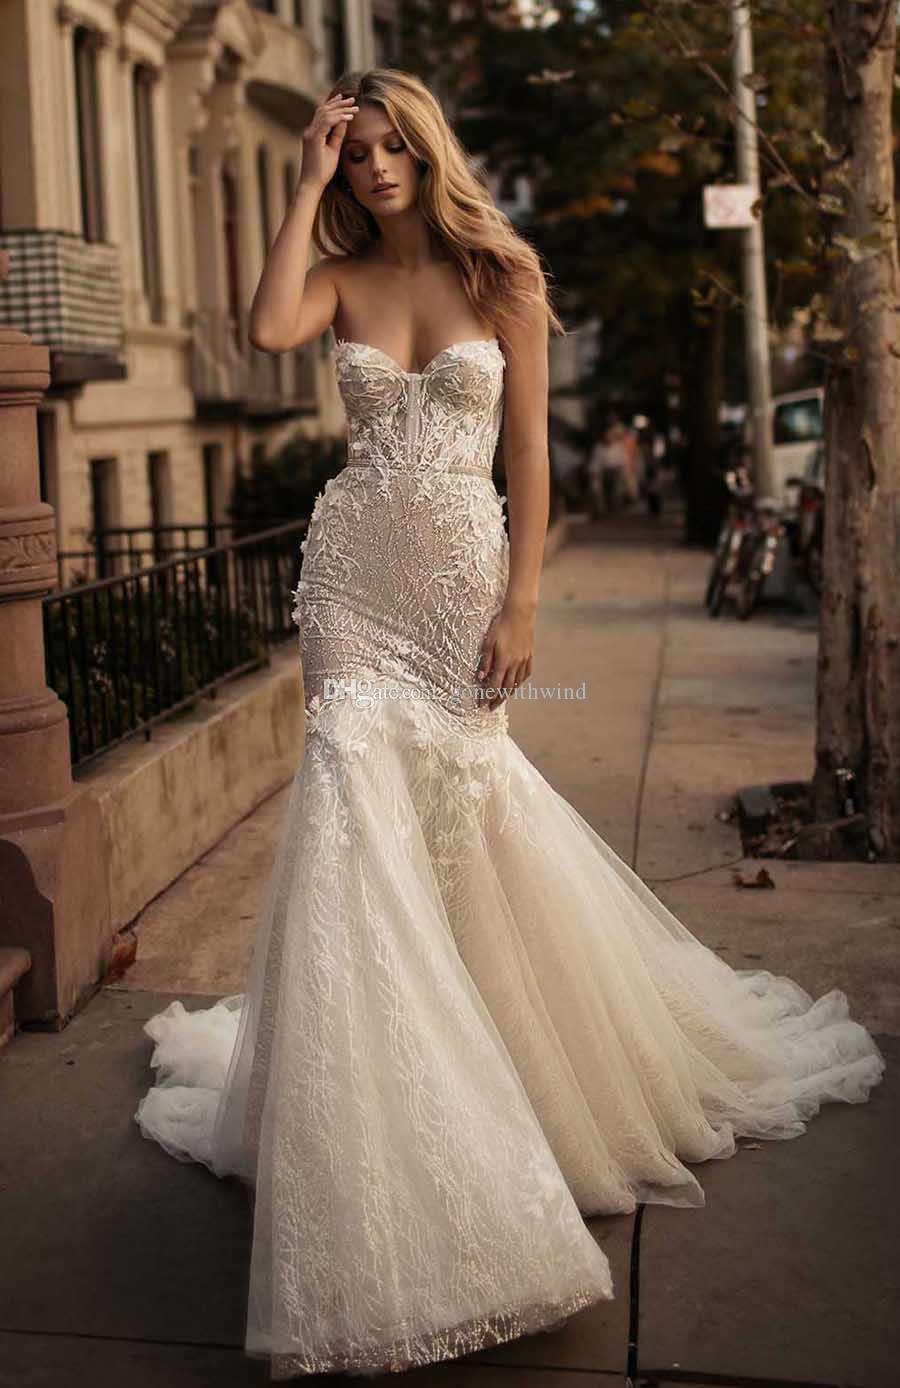 Corset Wedding Gown  2017 Berta Bridal Corset Wedding Dresses Sweetheart